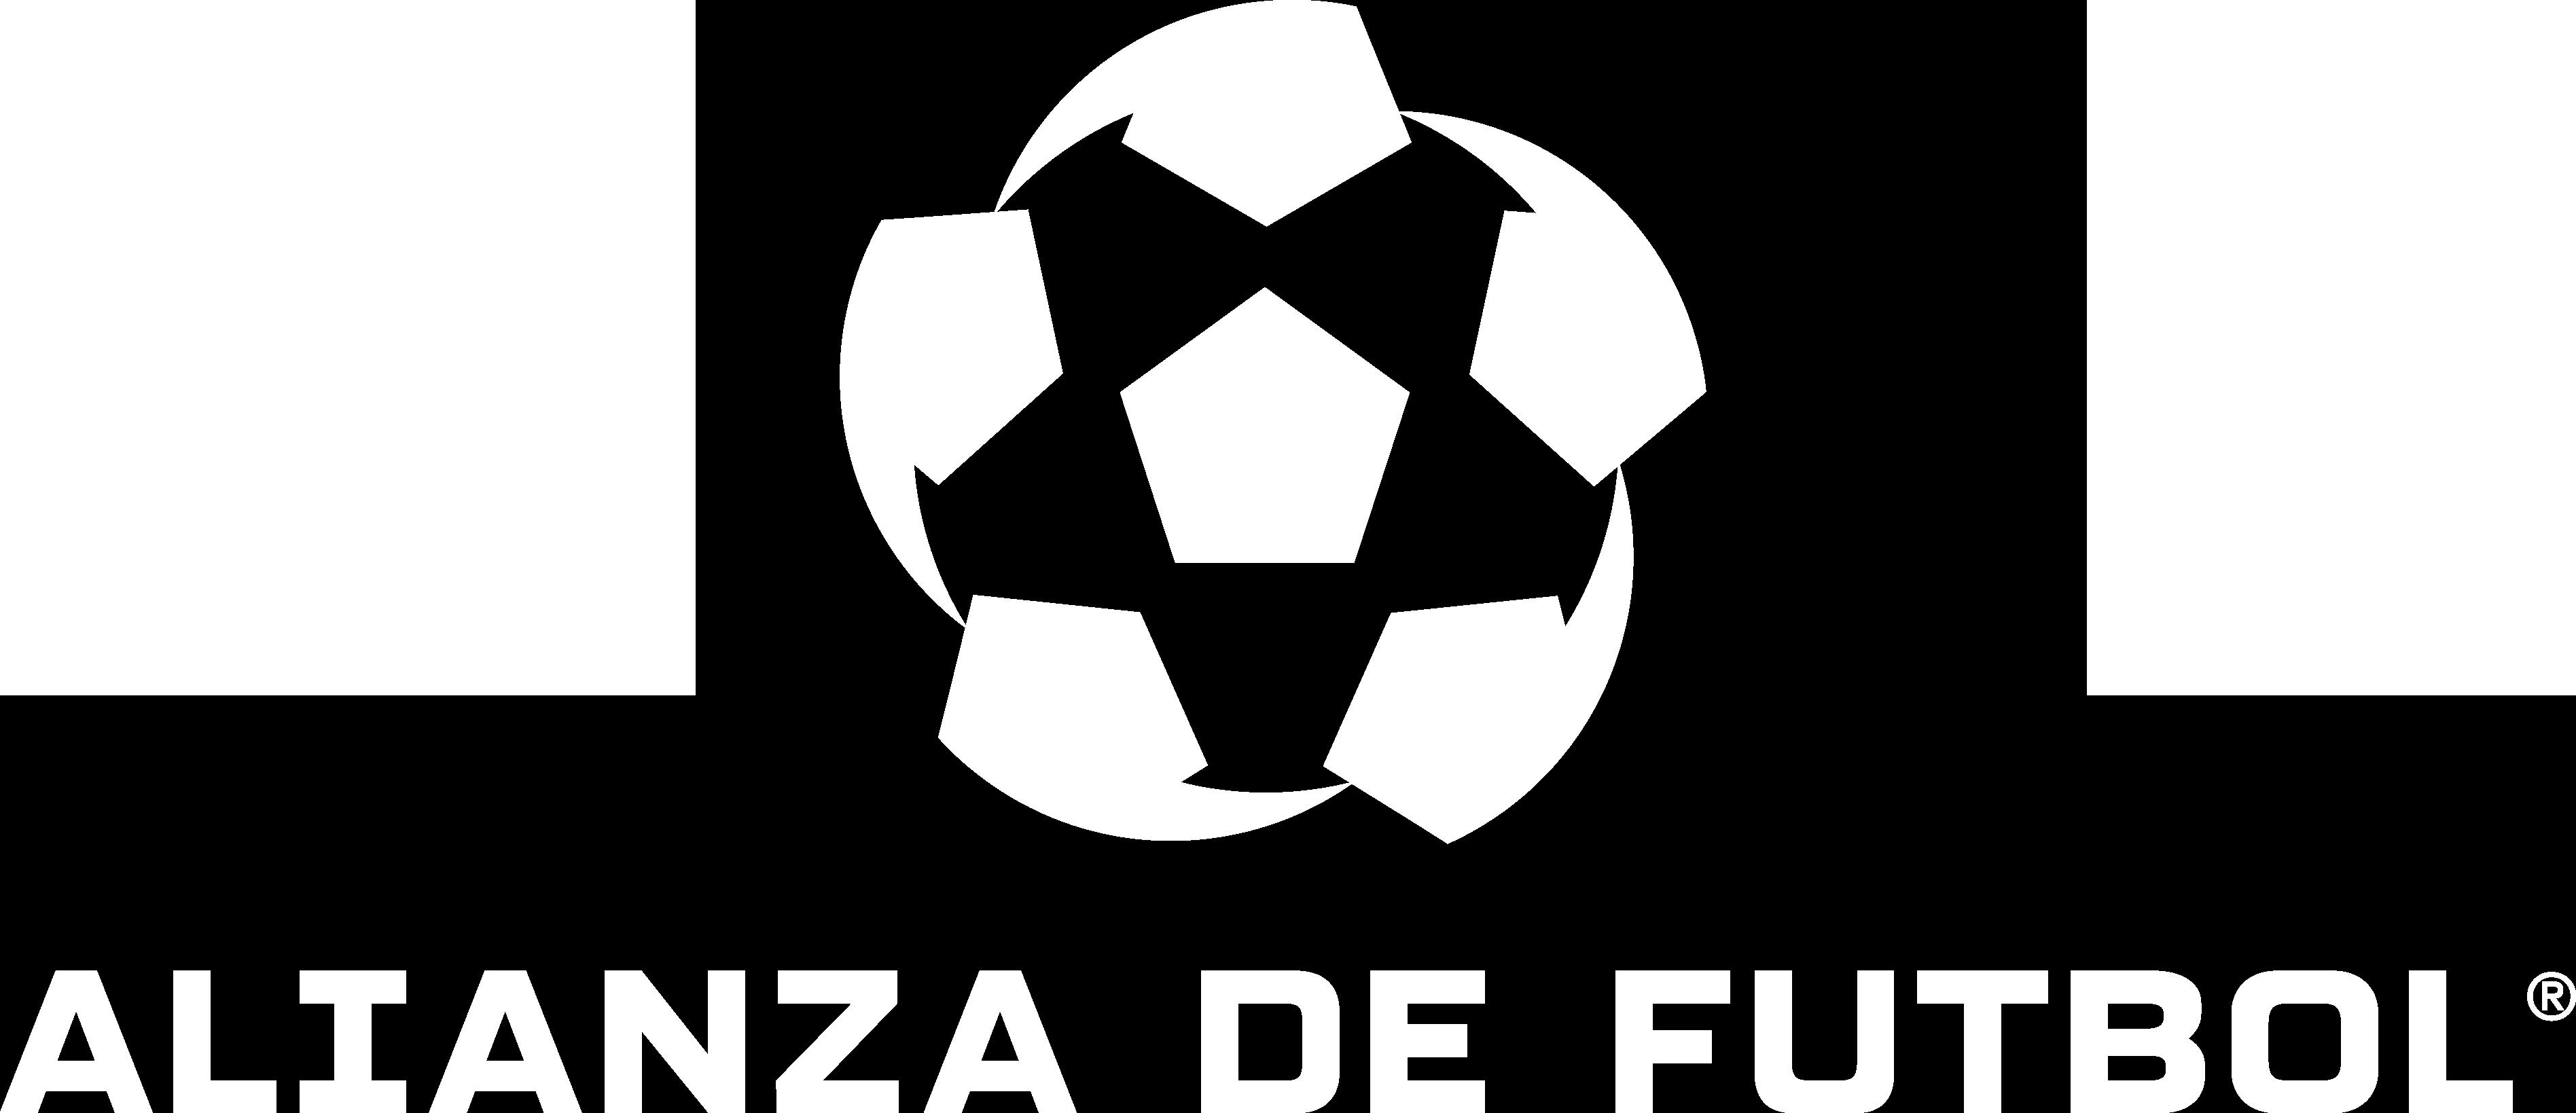 Alianza Futbol - Logo